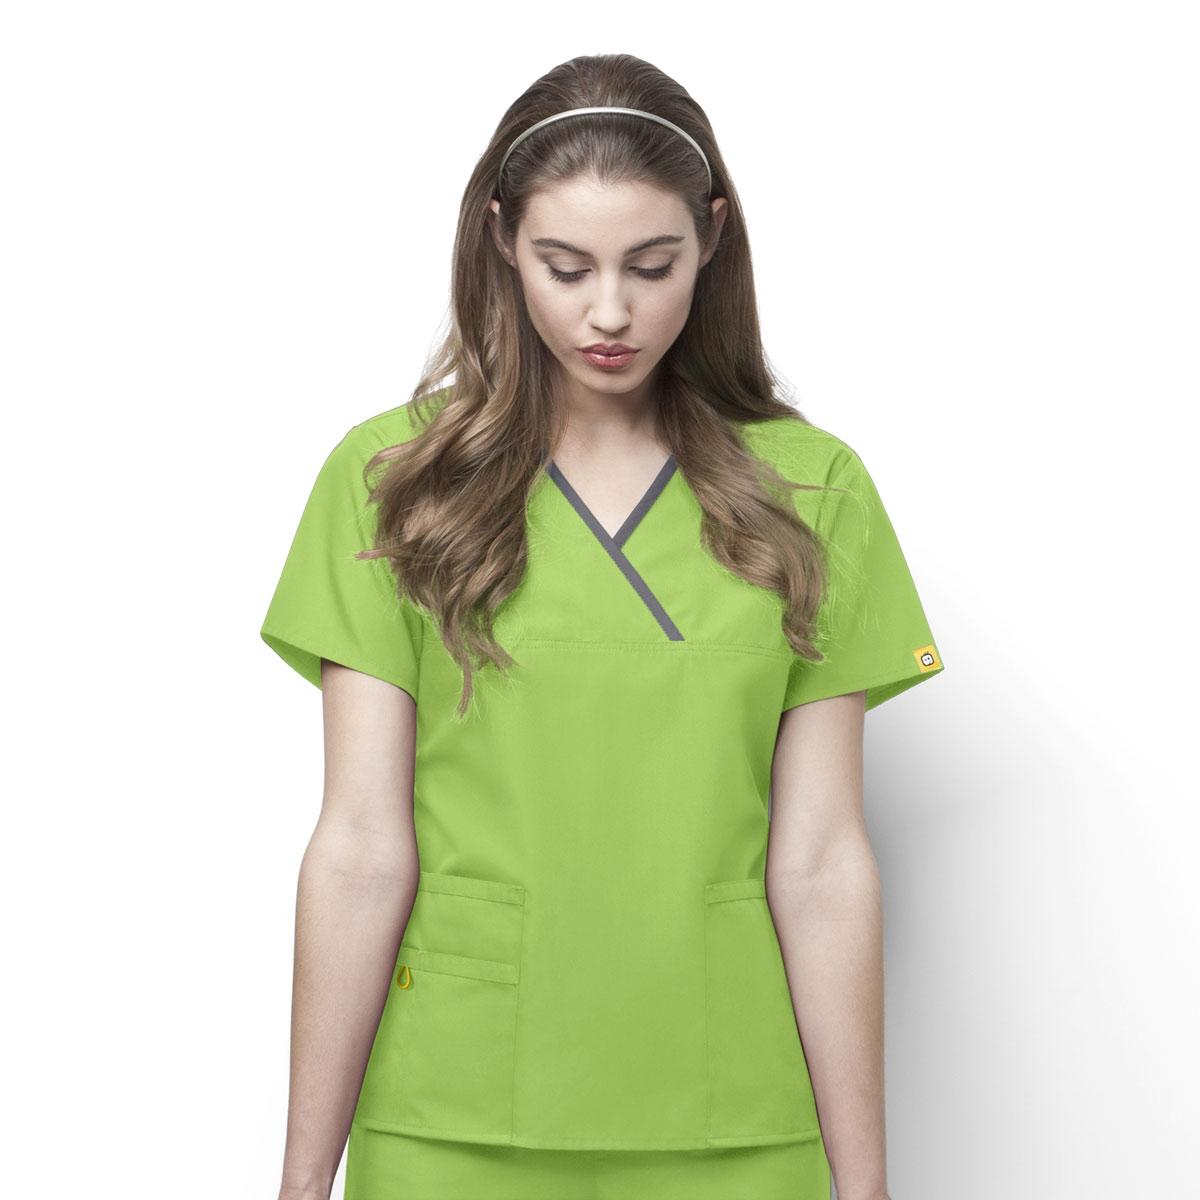 Details about  /Wonderwink Medical Scrub Khaki Origins Mock Wrap Top Top Sz XS-XXL NWT